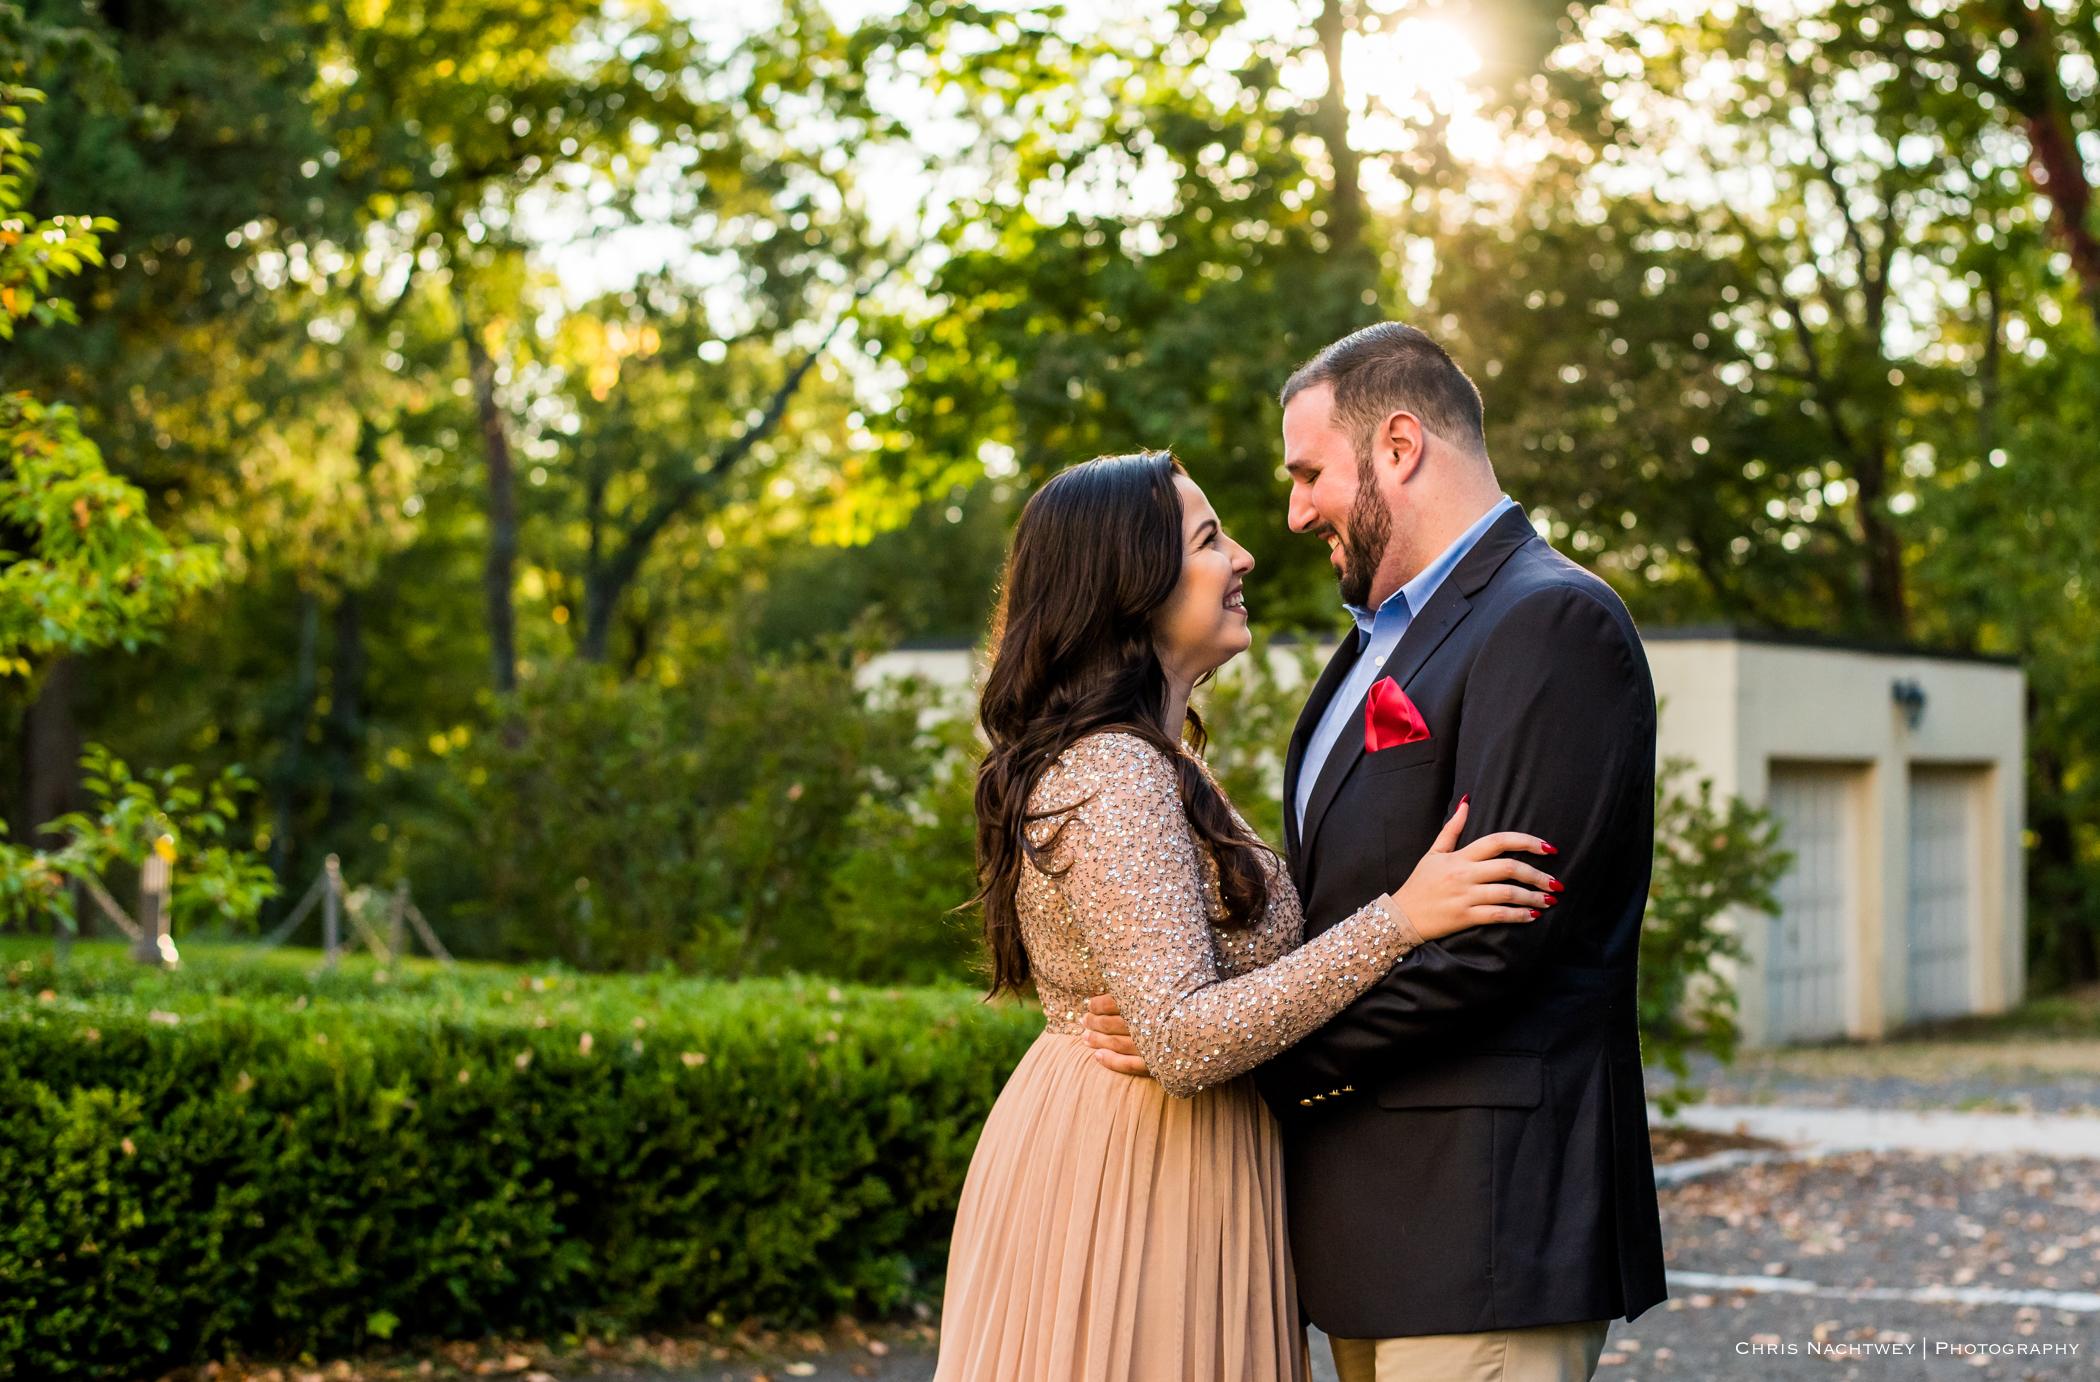 engagement-photos-wadsworth-mansion-ct-chris-nachtwey-photography-2017-1.jpg